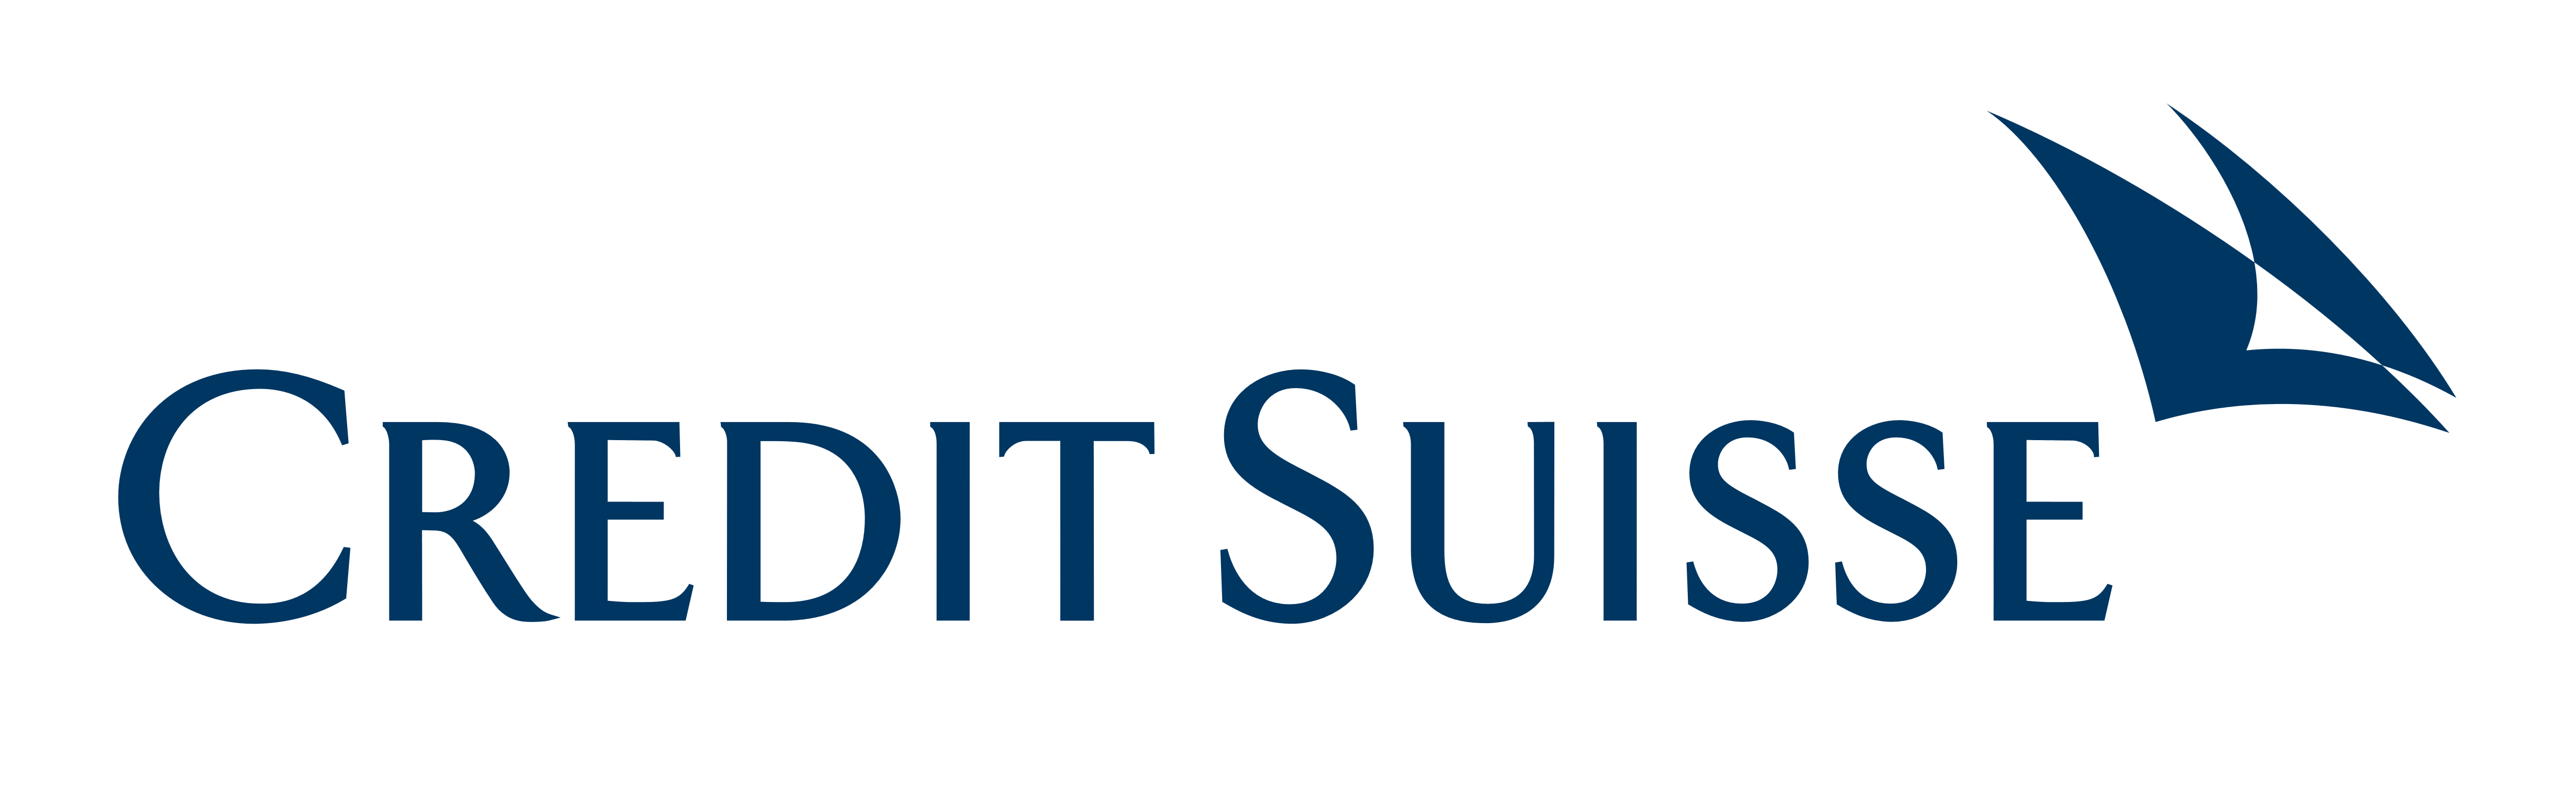 Credit Suisse | Founding Partner